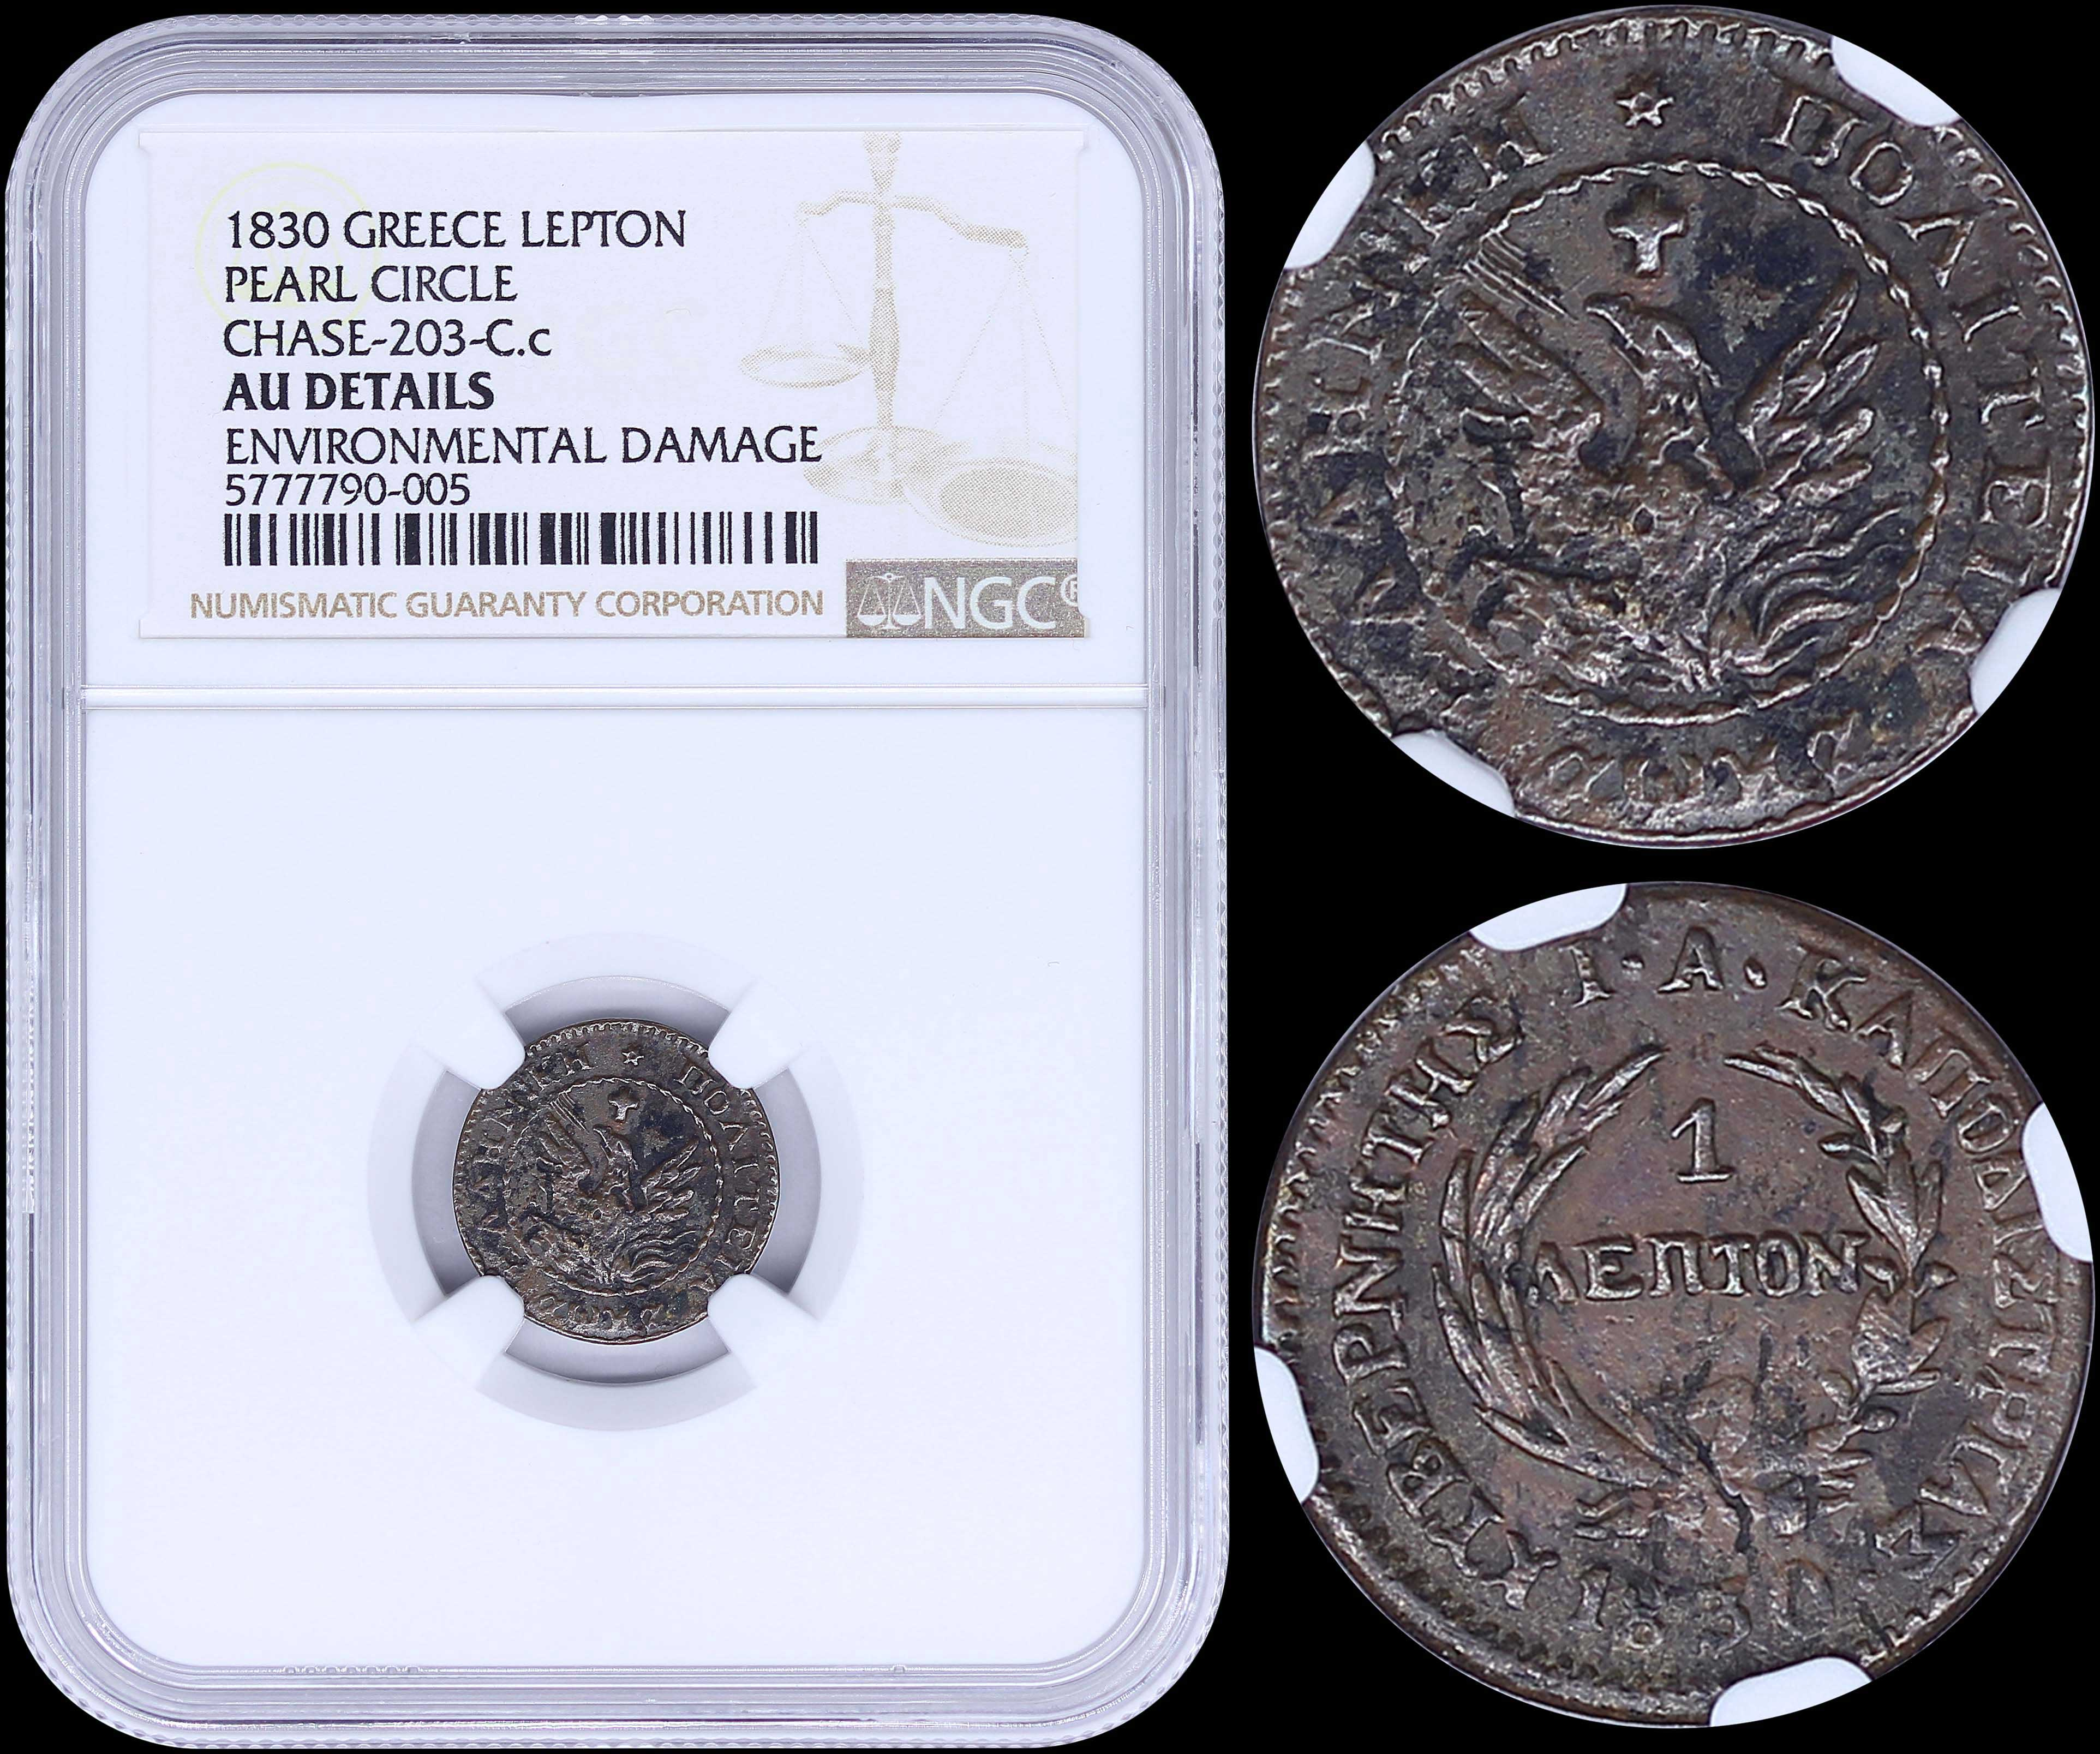 Lot 6009 - -  COINS & TOKENS governor capodistrias -  A. Karamitsos Public & Live Internet Auction 682 (Part A) Coins, Medals & Banknotes